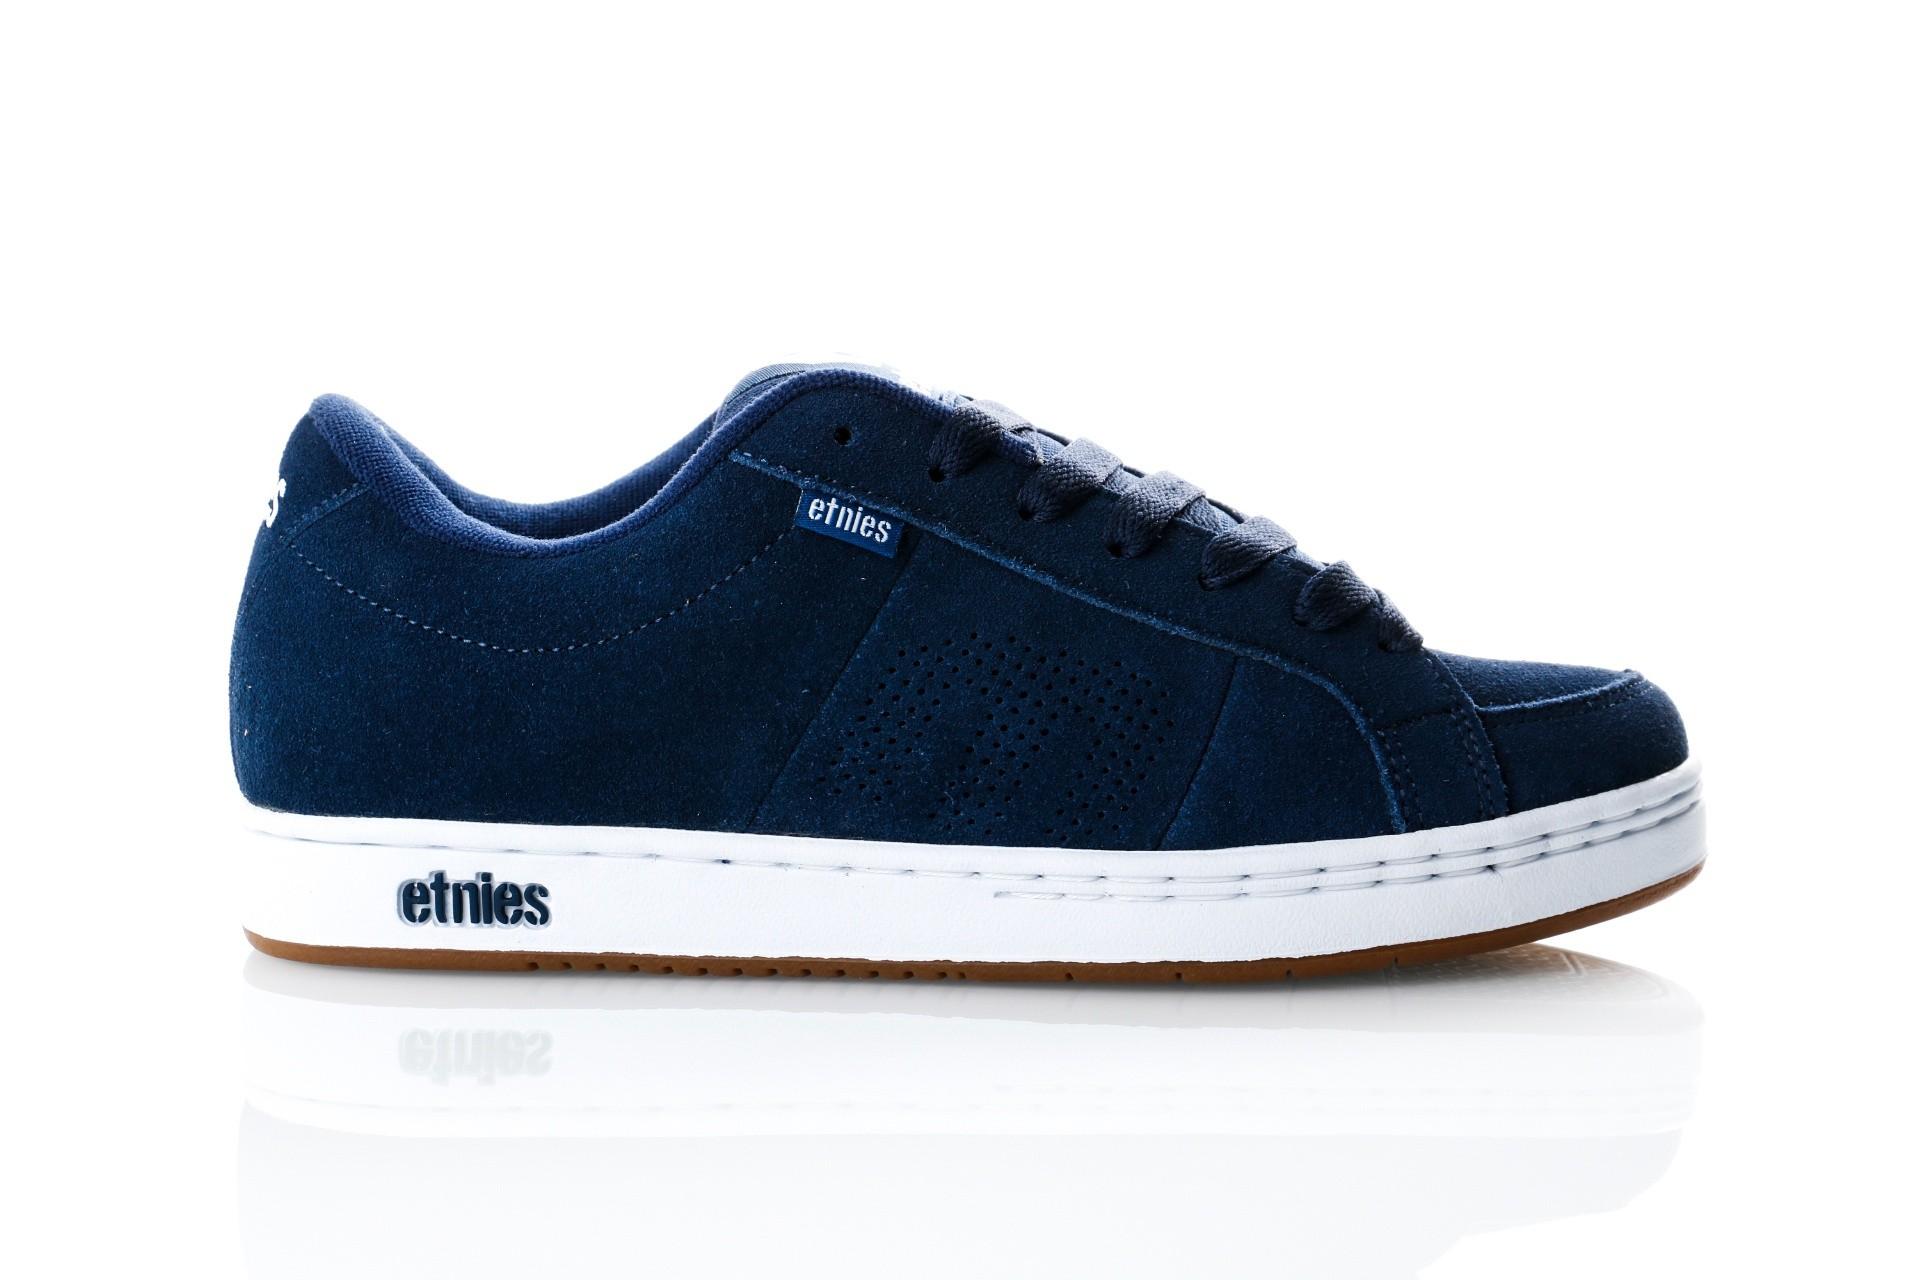 Foto van Etnies KINGPIN 4101000091 Sneakers NAVY/WHITE/GUM